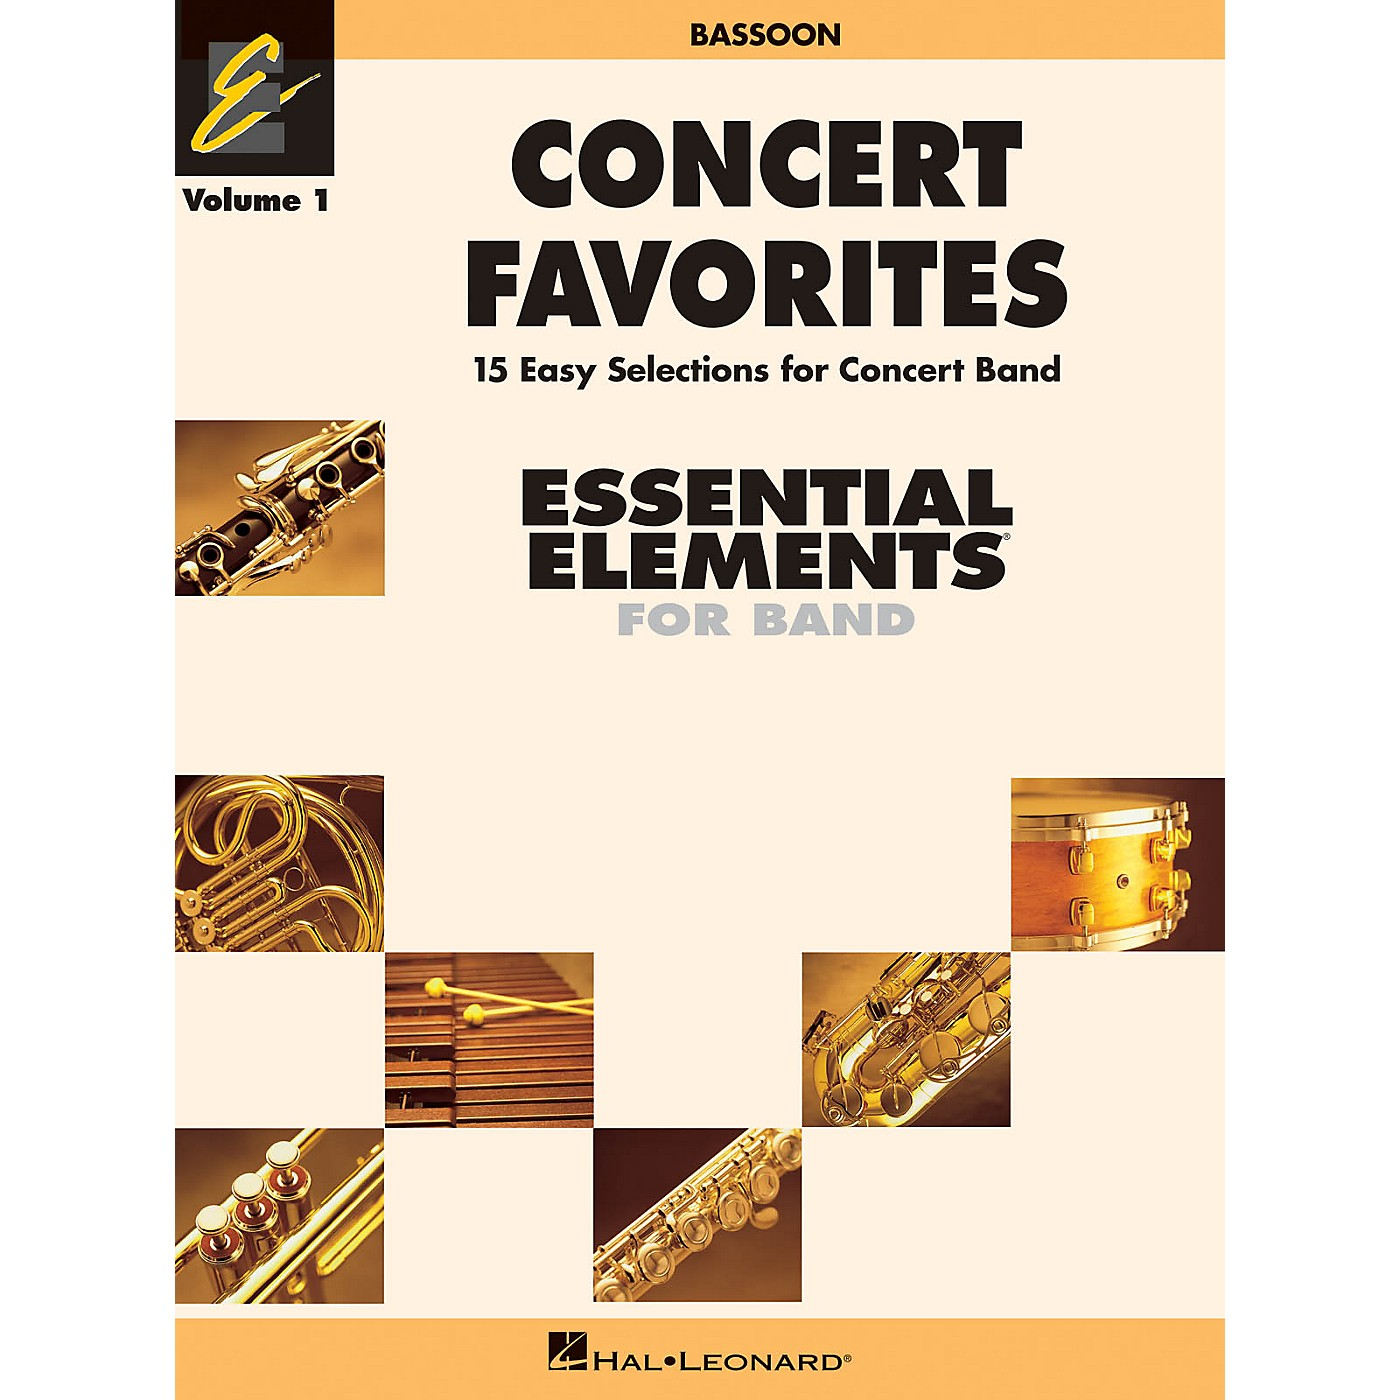 Hal Leonard Concert Favorites Vol. 1 - Bassoon Concert Band Level 1-1.5 Arranged by Michael Sweeney thumbnail